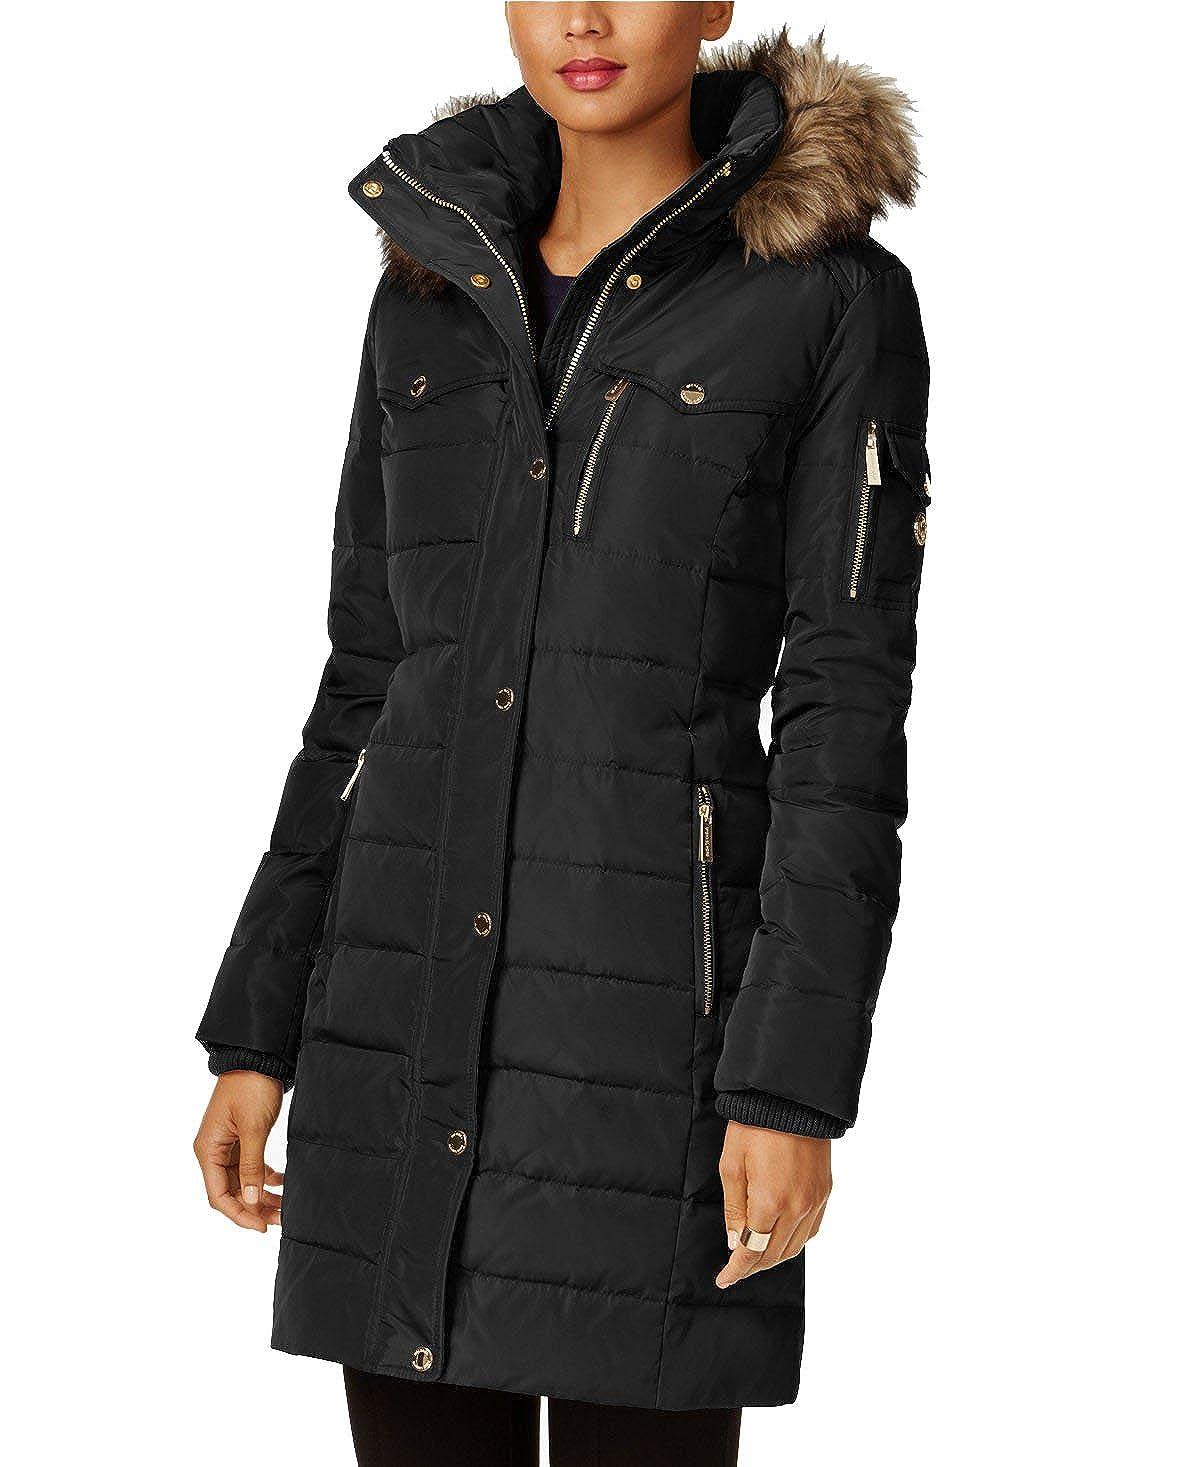 ad4e03866938 Amazon.com  Michael Kors Faux Fur Trim Down Puffer Coat  Clothing